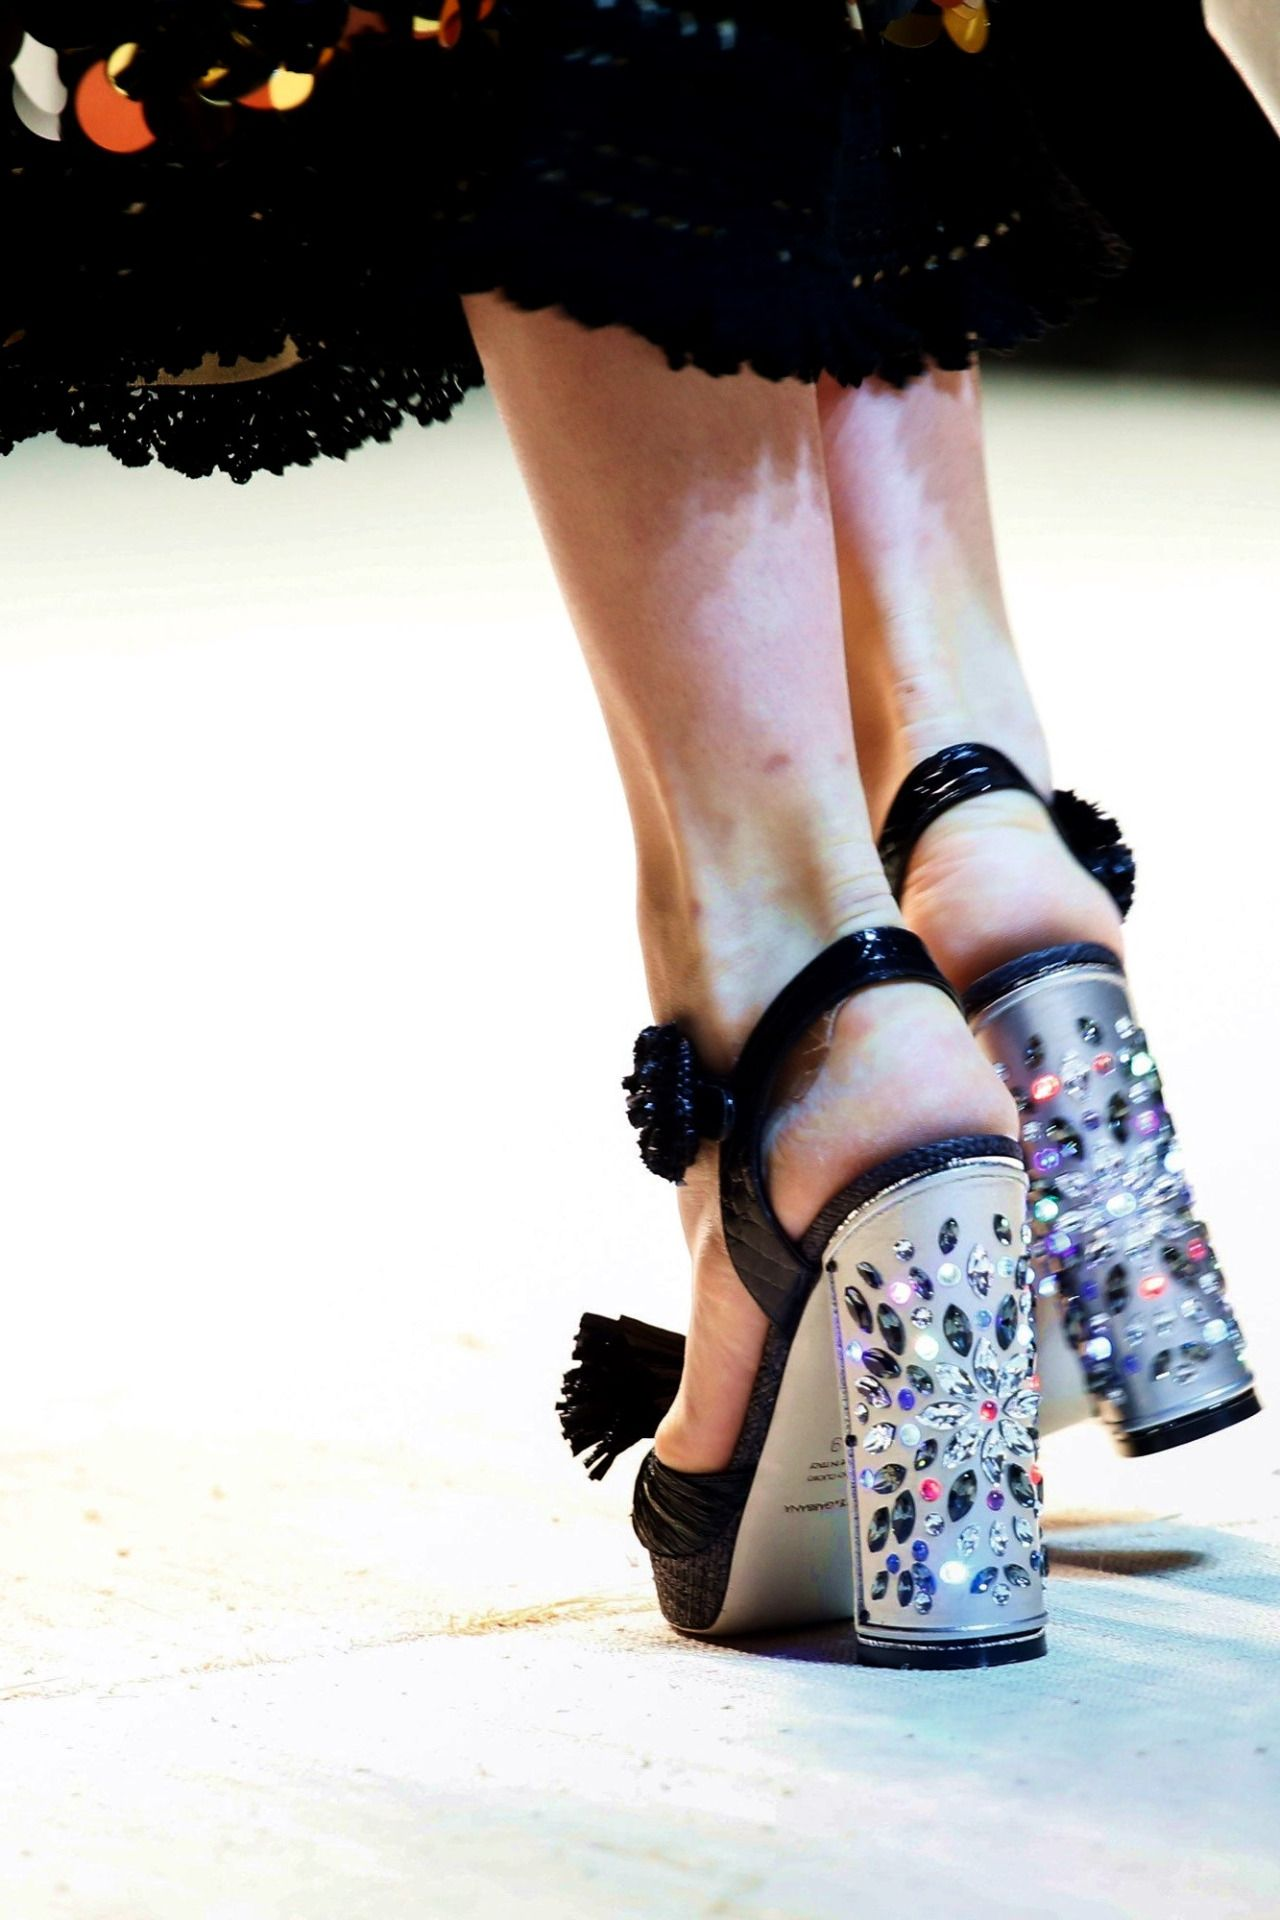 Dolce & Gabbana | Milan Fashion Week | Spring 2017 - welcome in the world of fashion